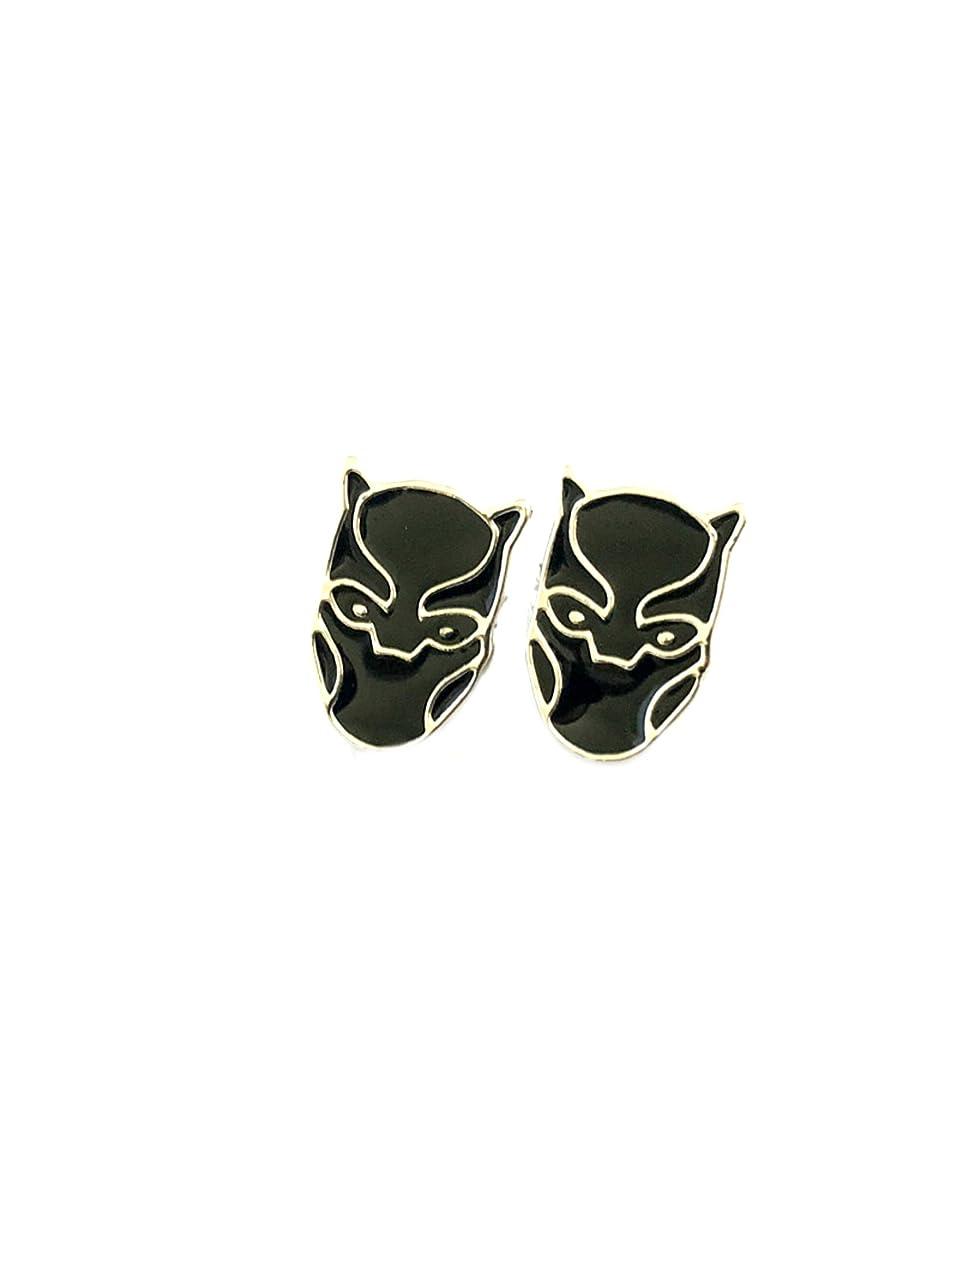 Black Panther Post Stud Silvertone Premium Quality Earrings Marvel Comics 2018 Movies Avengers Infinity War Cartoon Superhero Theme